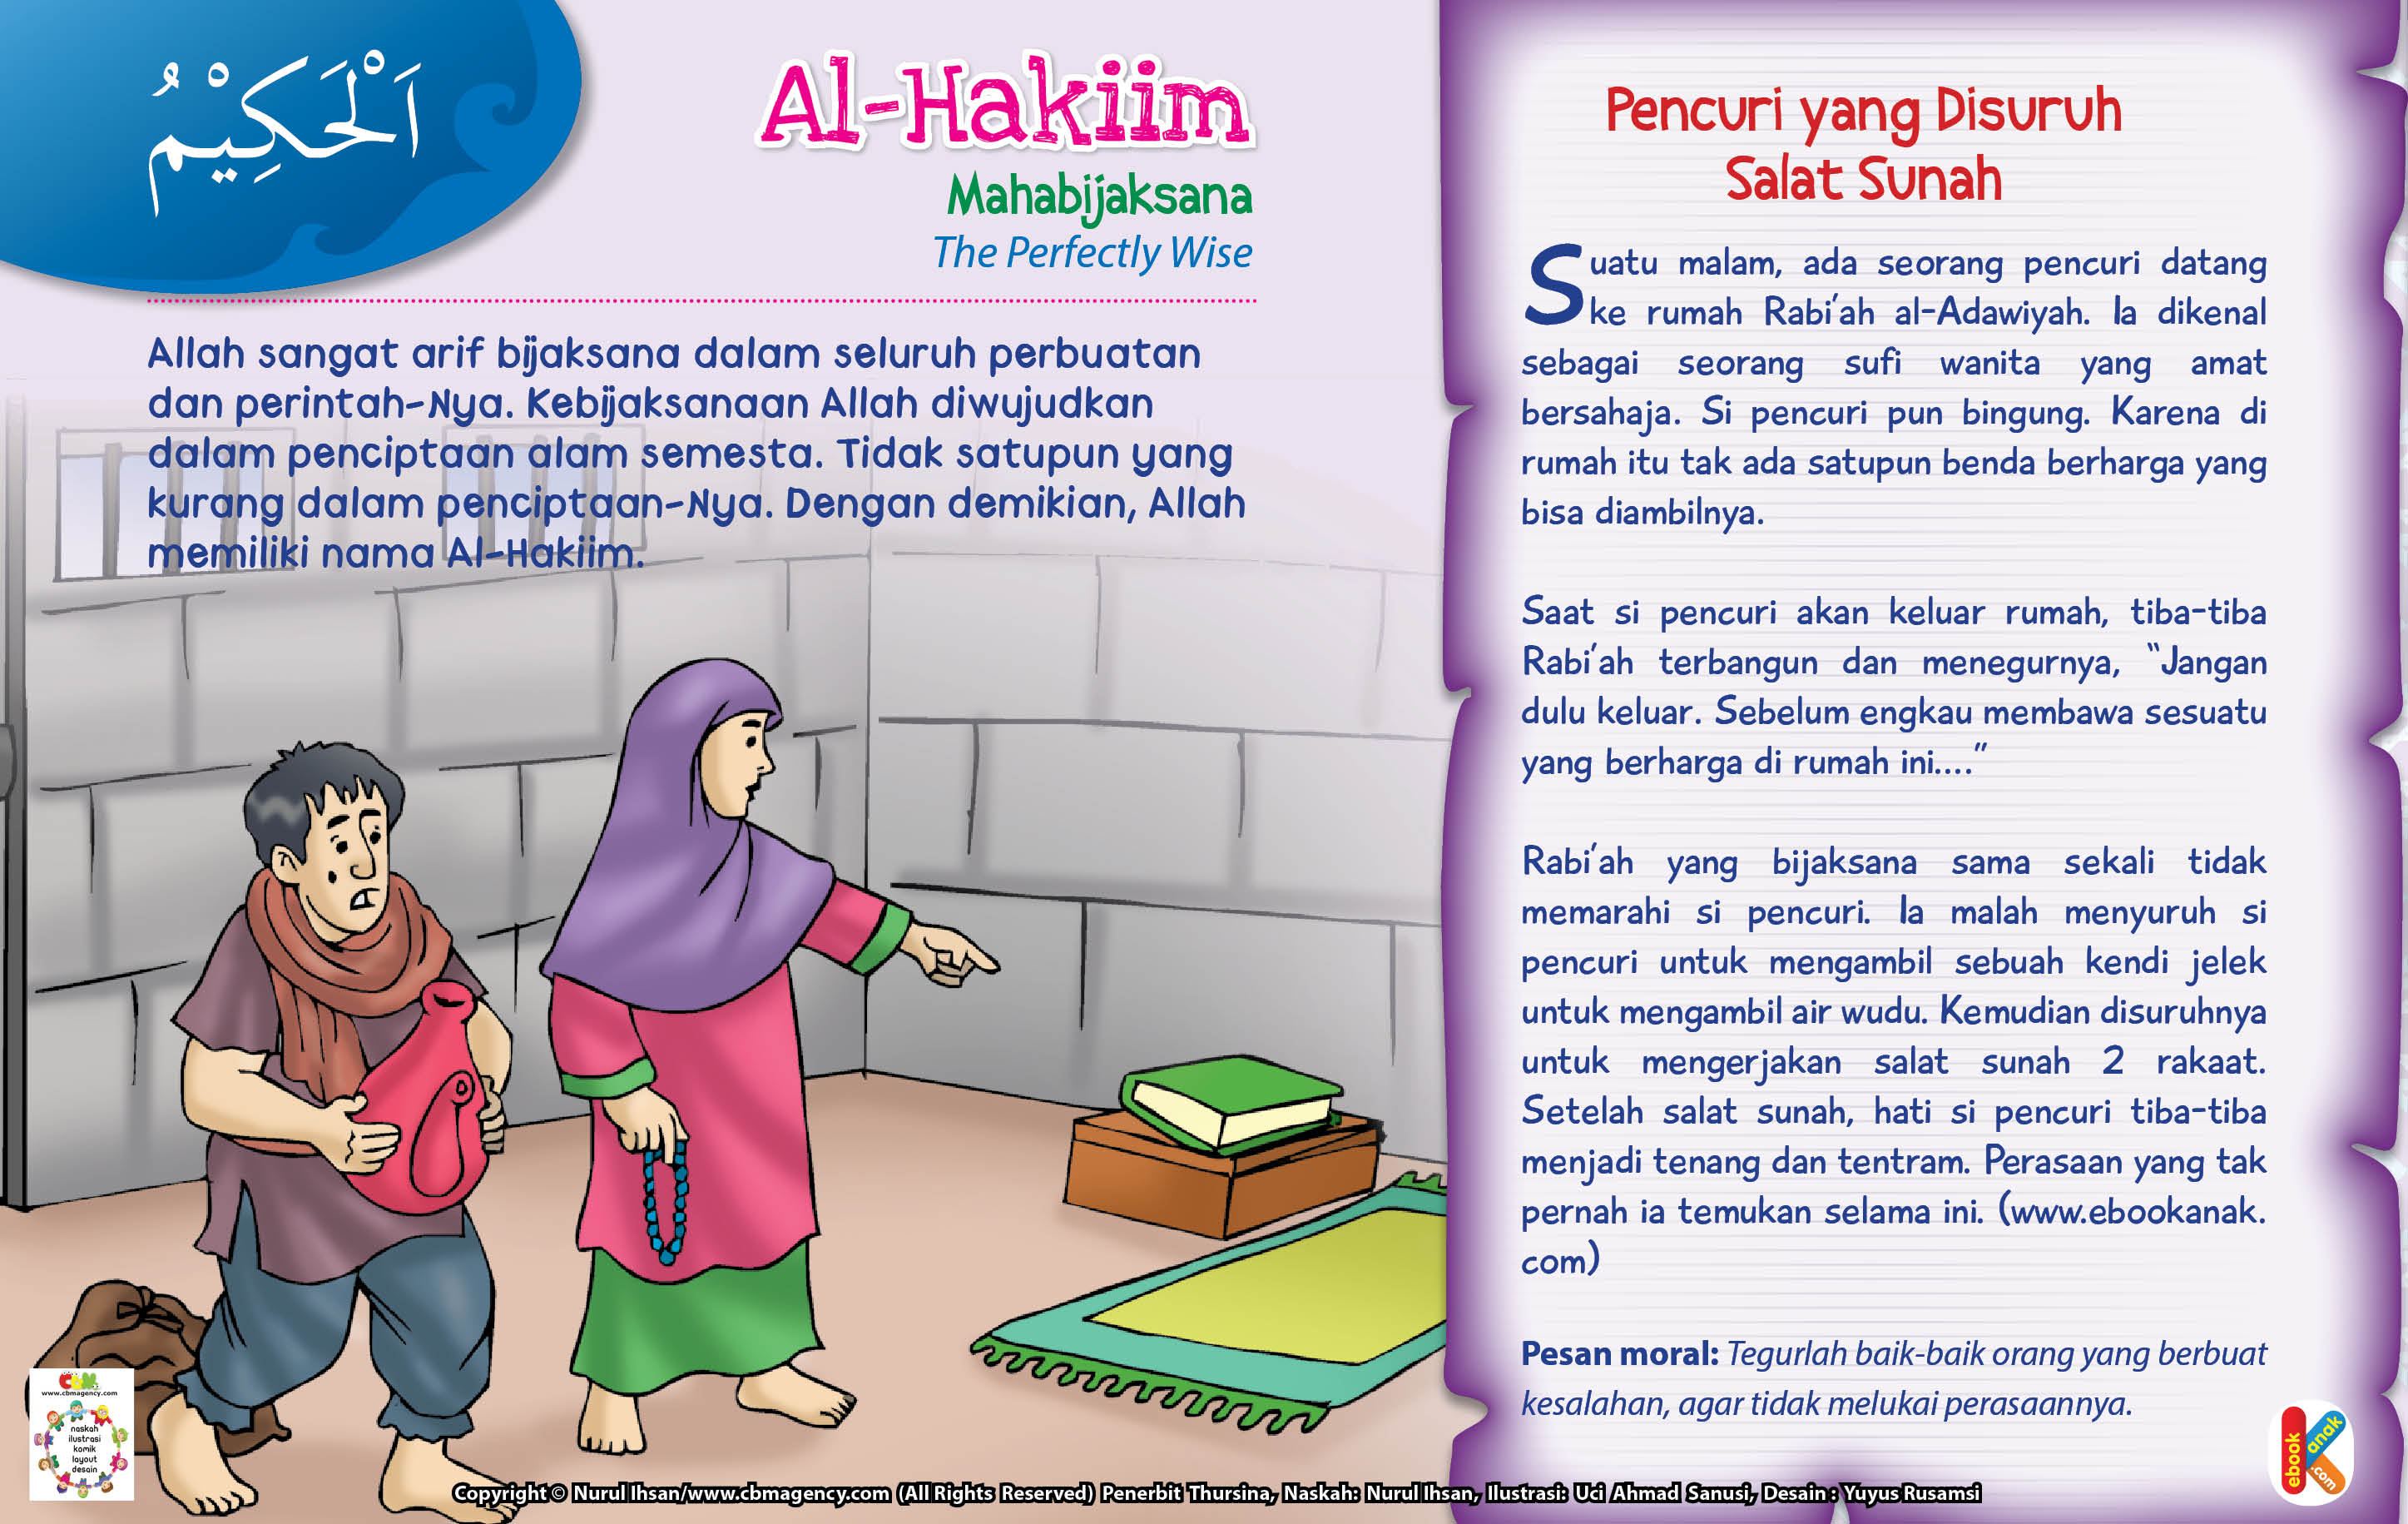 Rabi'ah Al-Adawiyah malah menyuruh si pencuri untuk mengambil sebuah kendi jelek untuk mengambil air wudu.